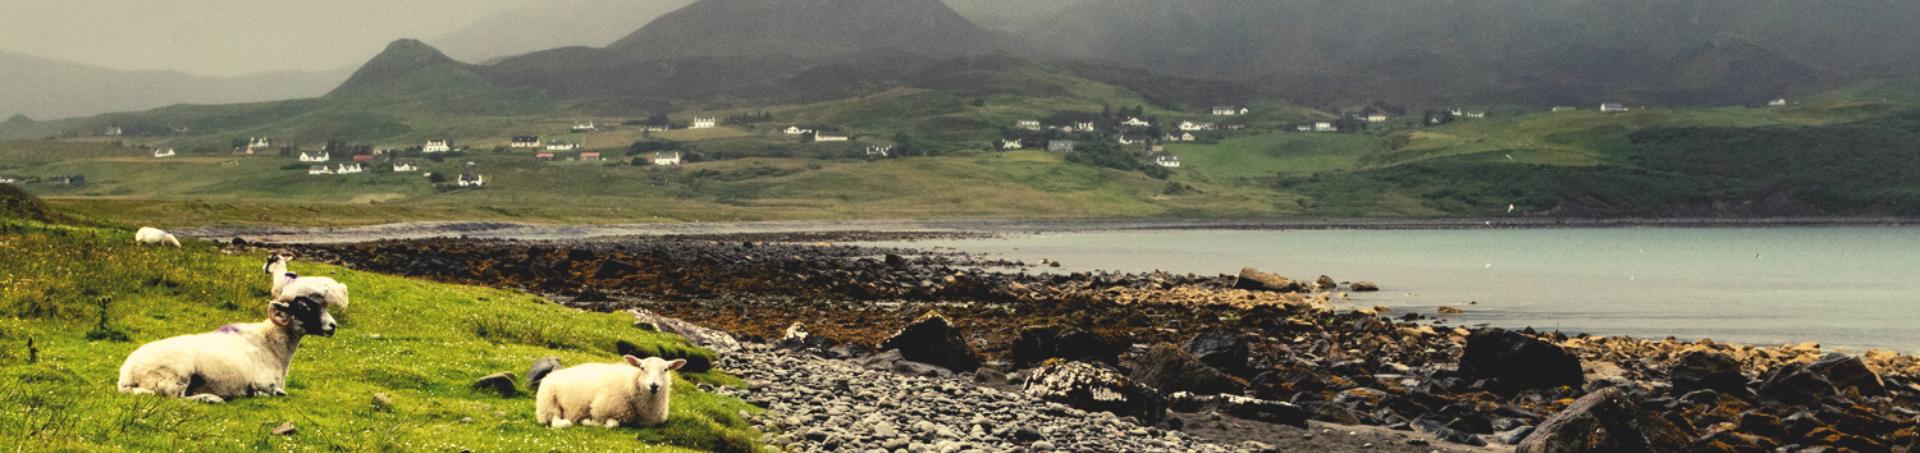 Destination Scozia